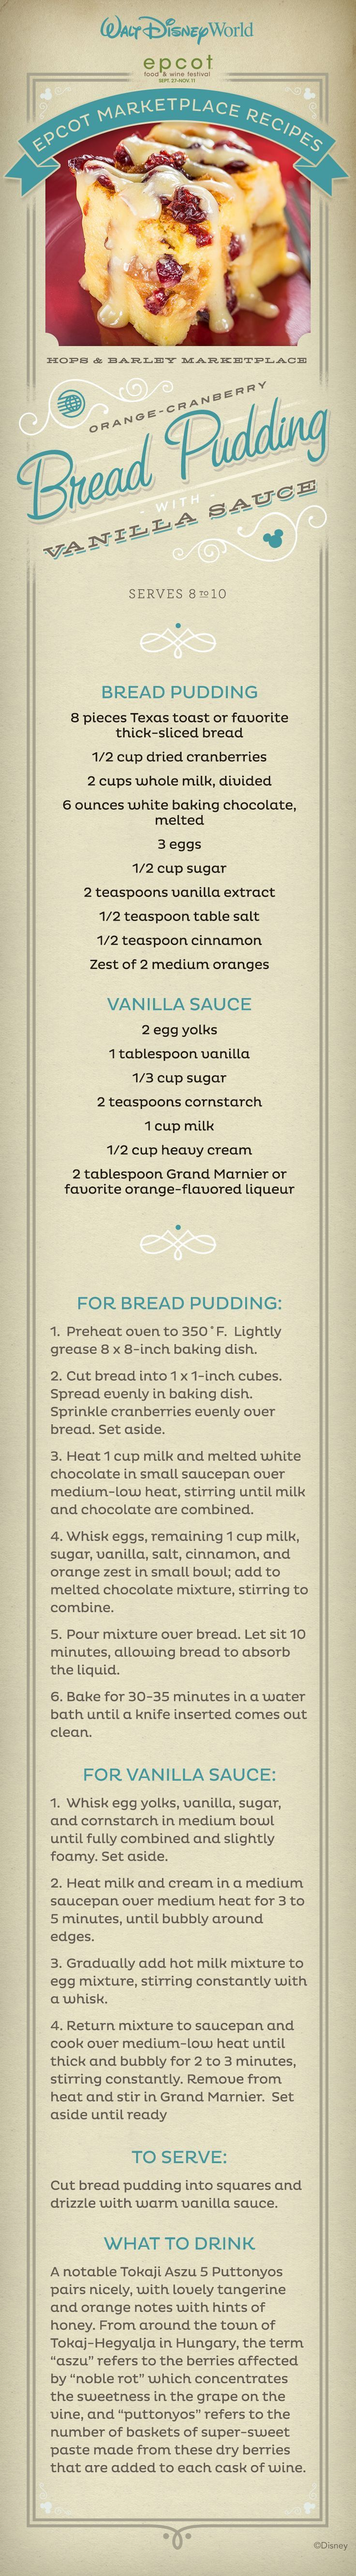 The Orange-Cranberry Bread Pudding recipe with Vanilla Sauce from #Disney: